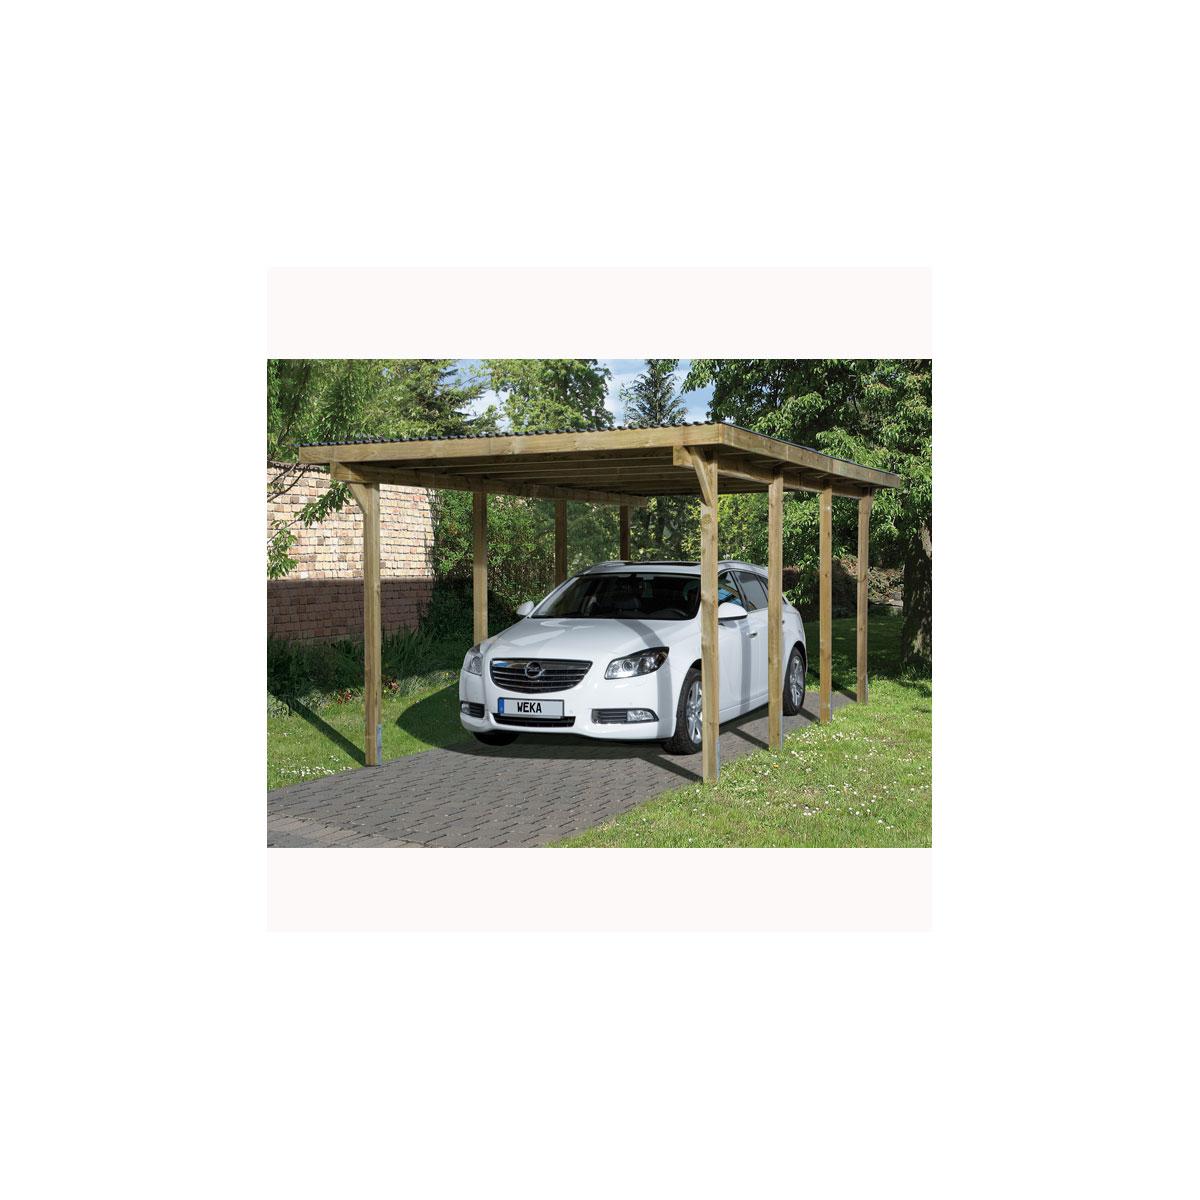 Carports - Carport 606 P.2 300x600  - Onlineshop Hellweg